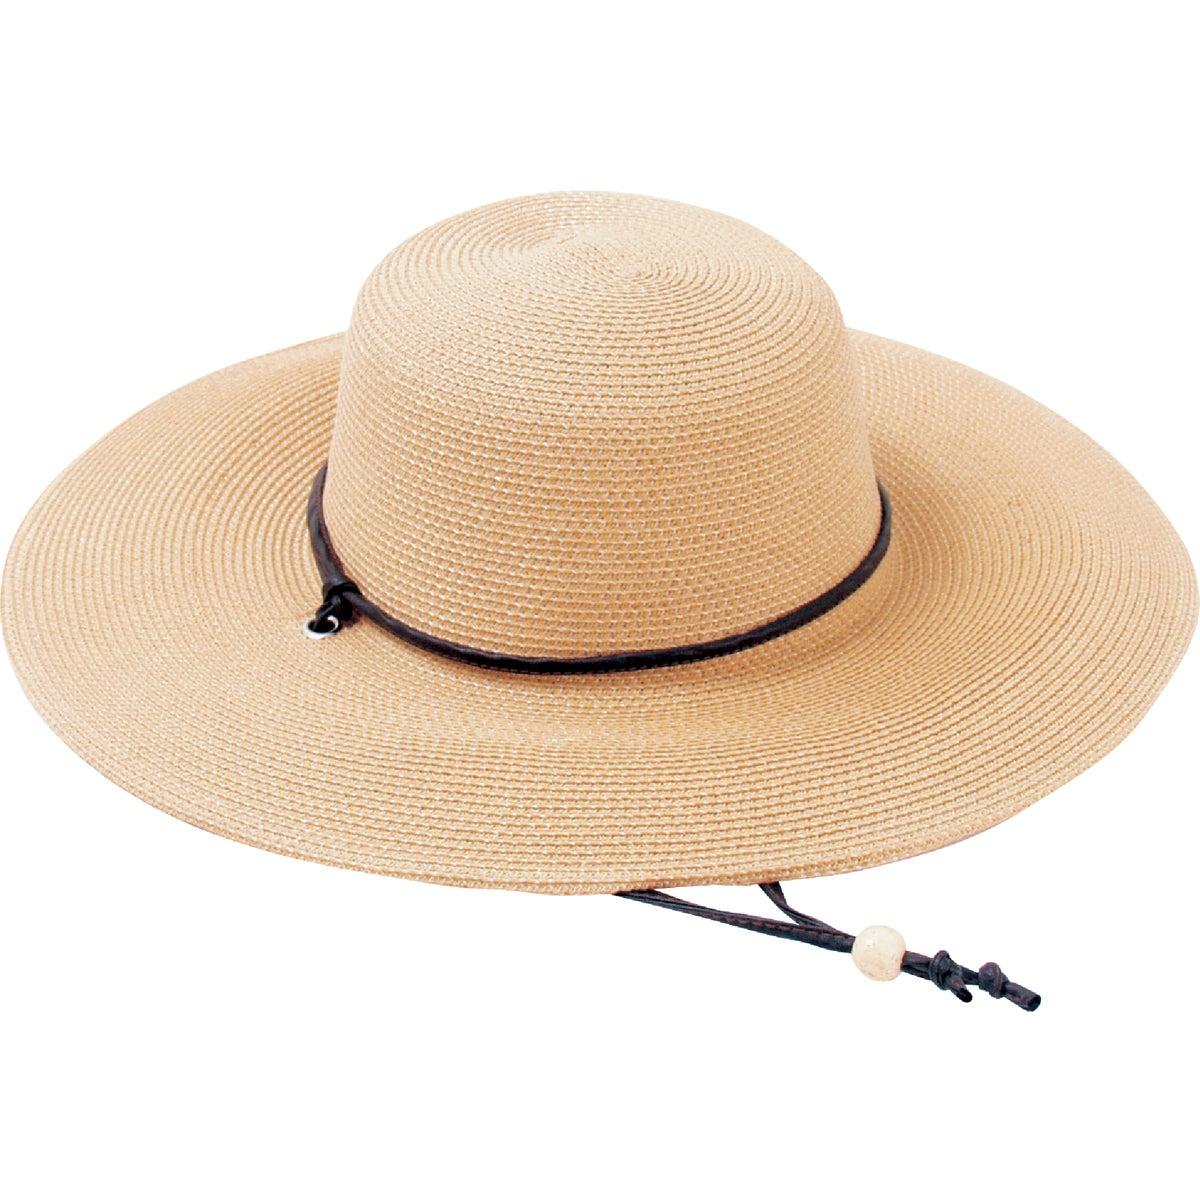 Sloggers Sun Hat, 442LB01